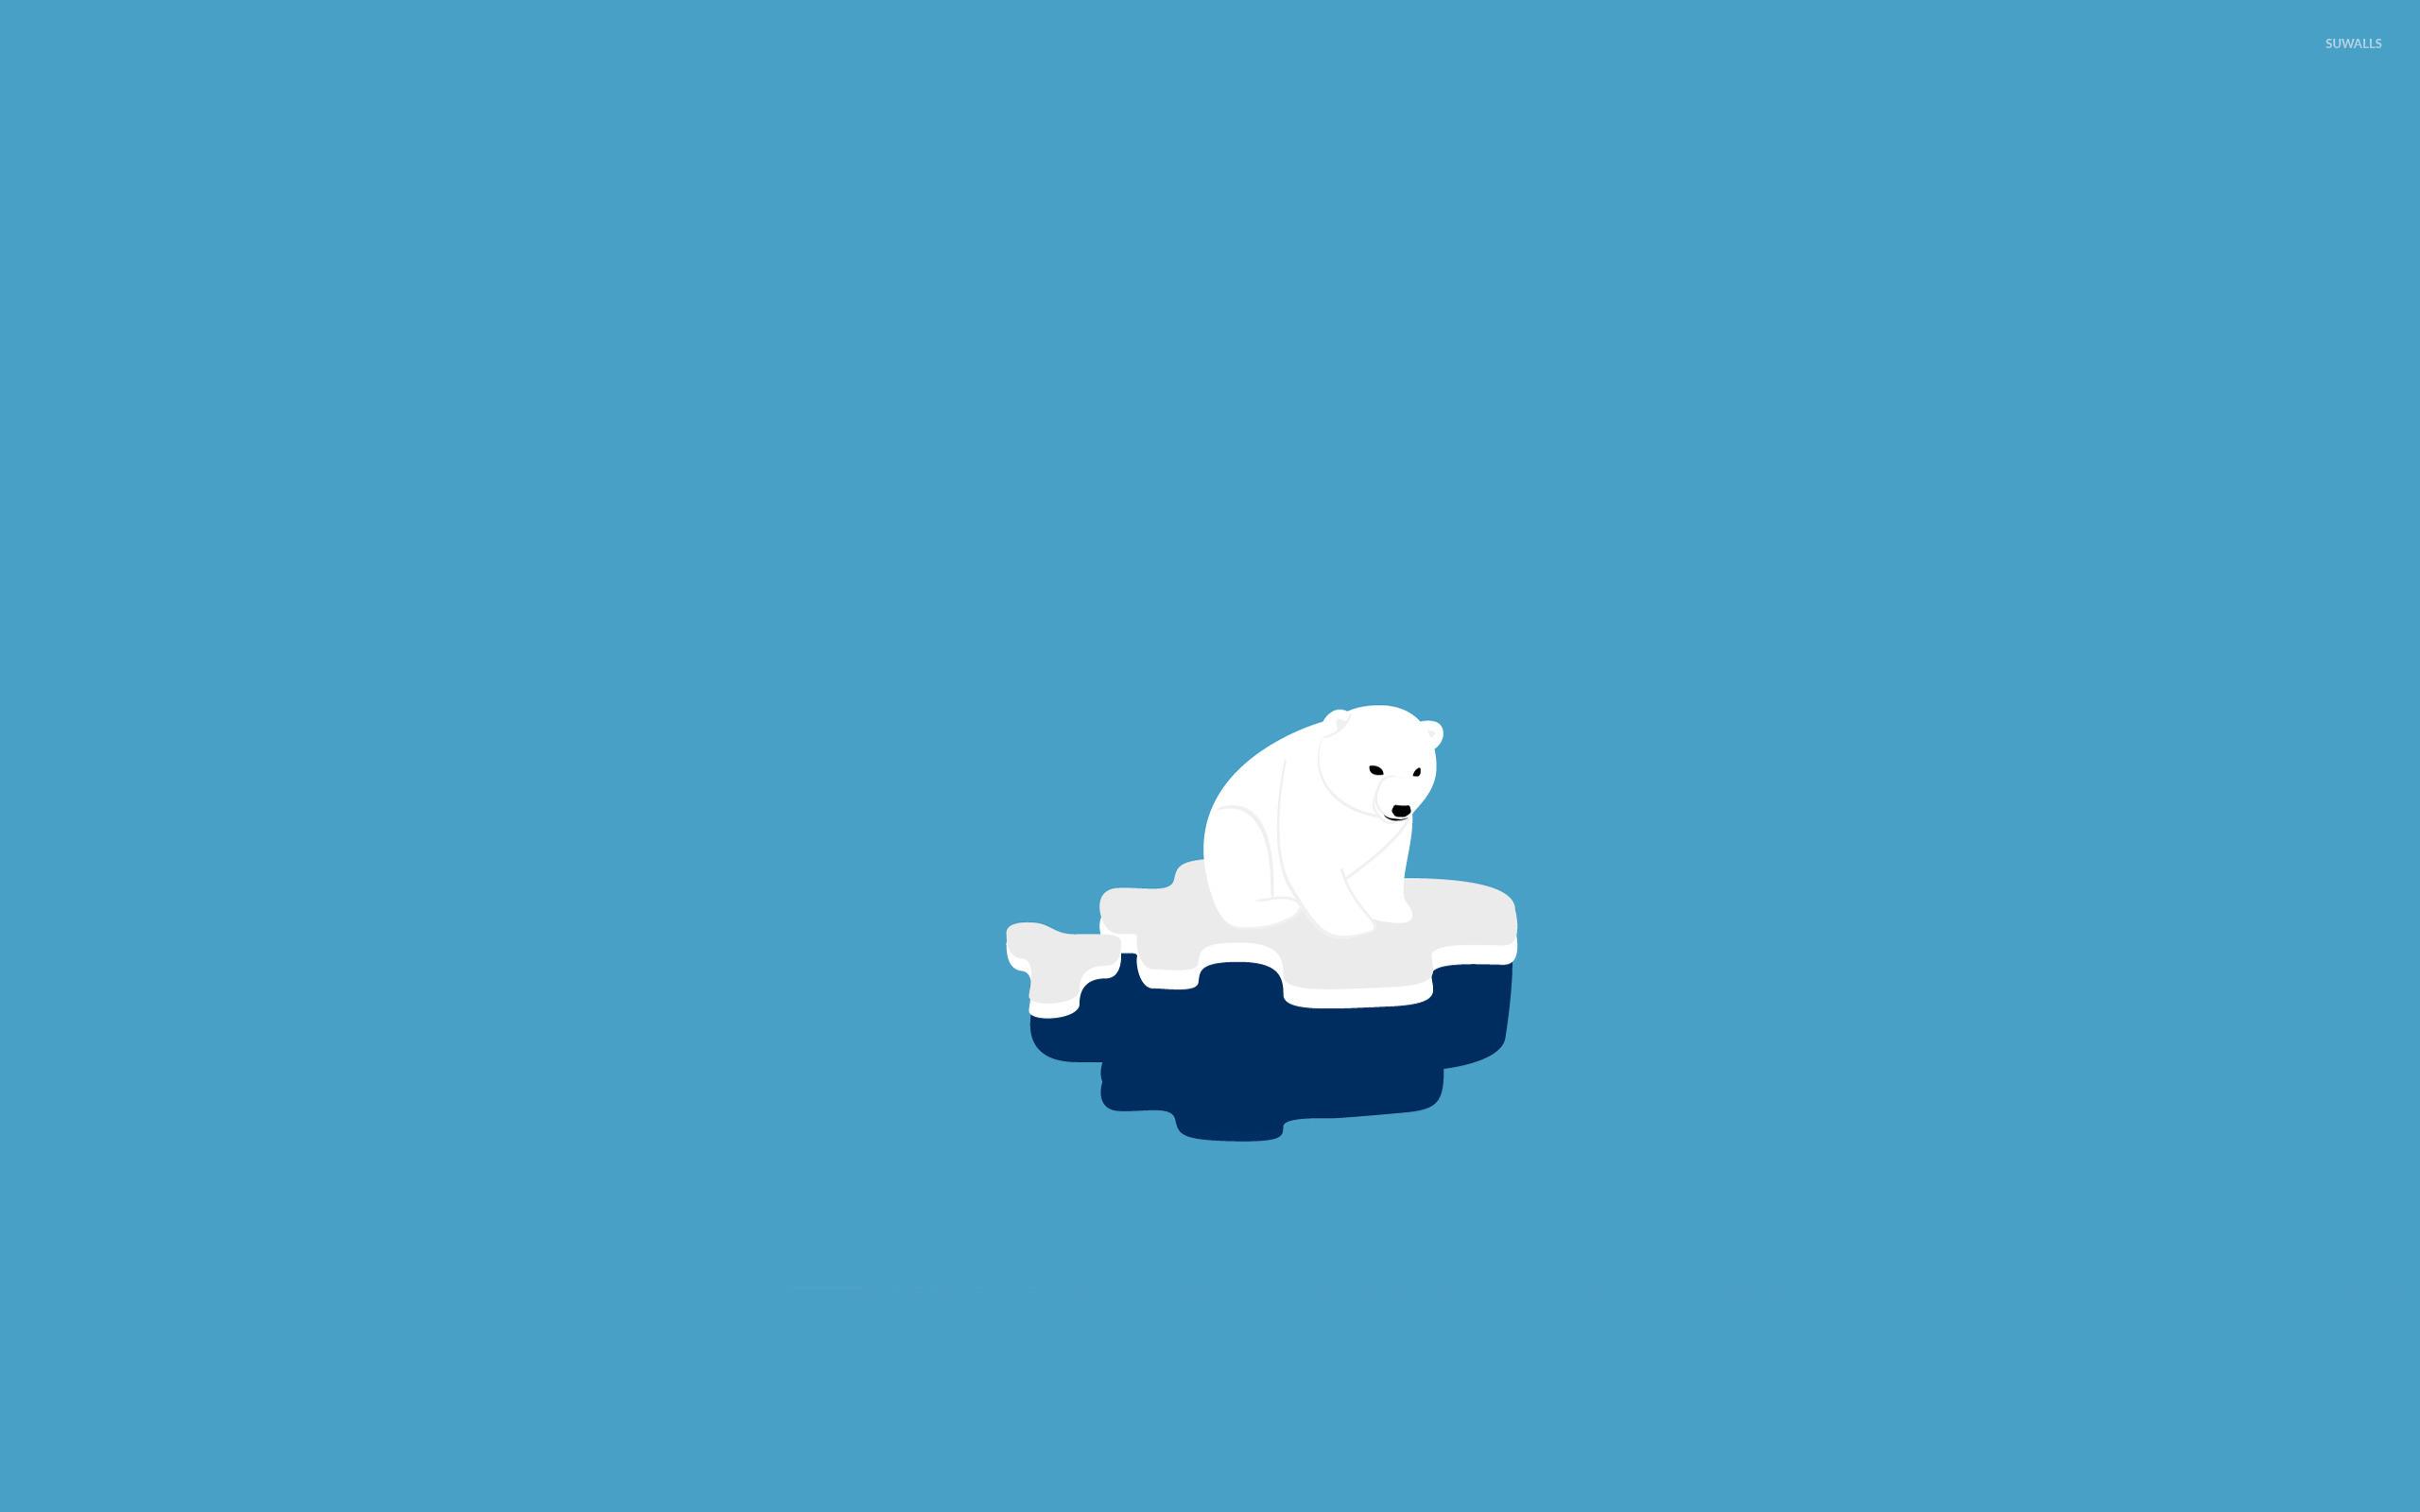 Polar bear wallpaper - Minimalistic